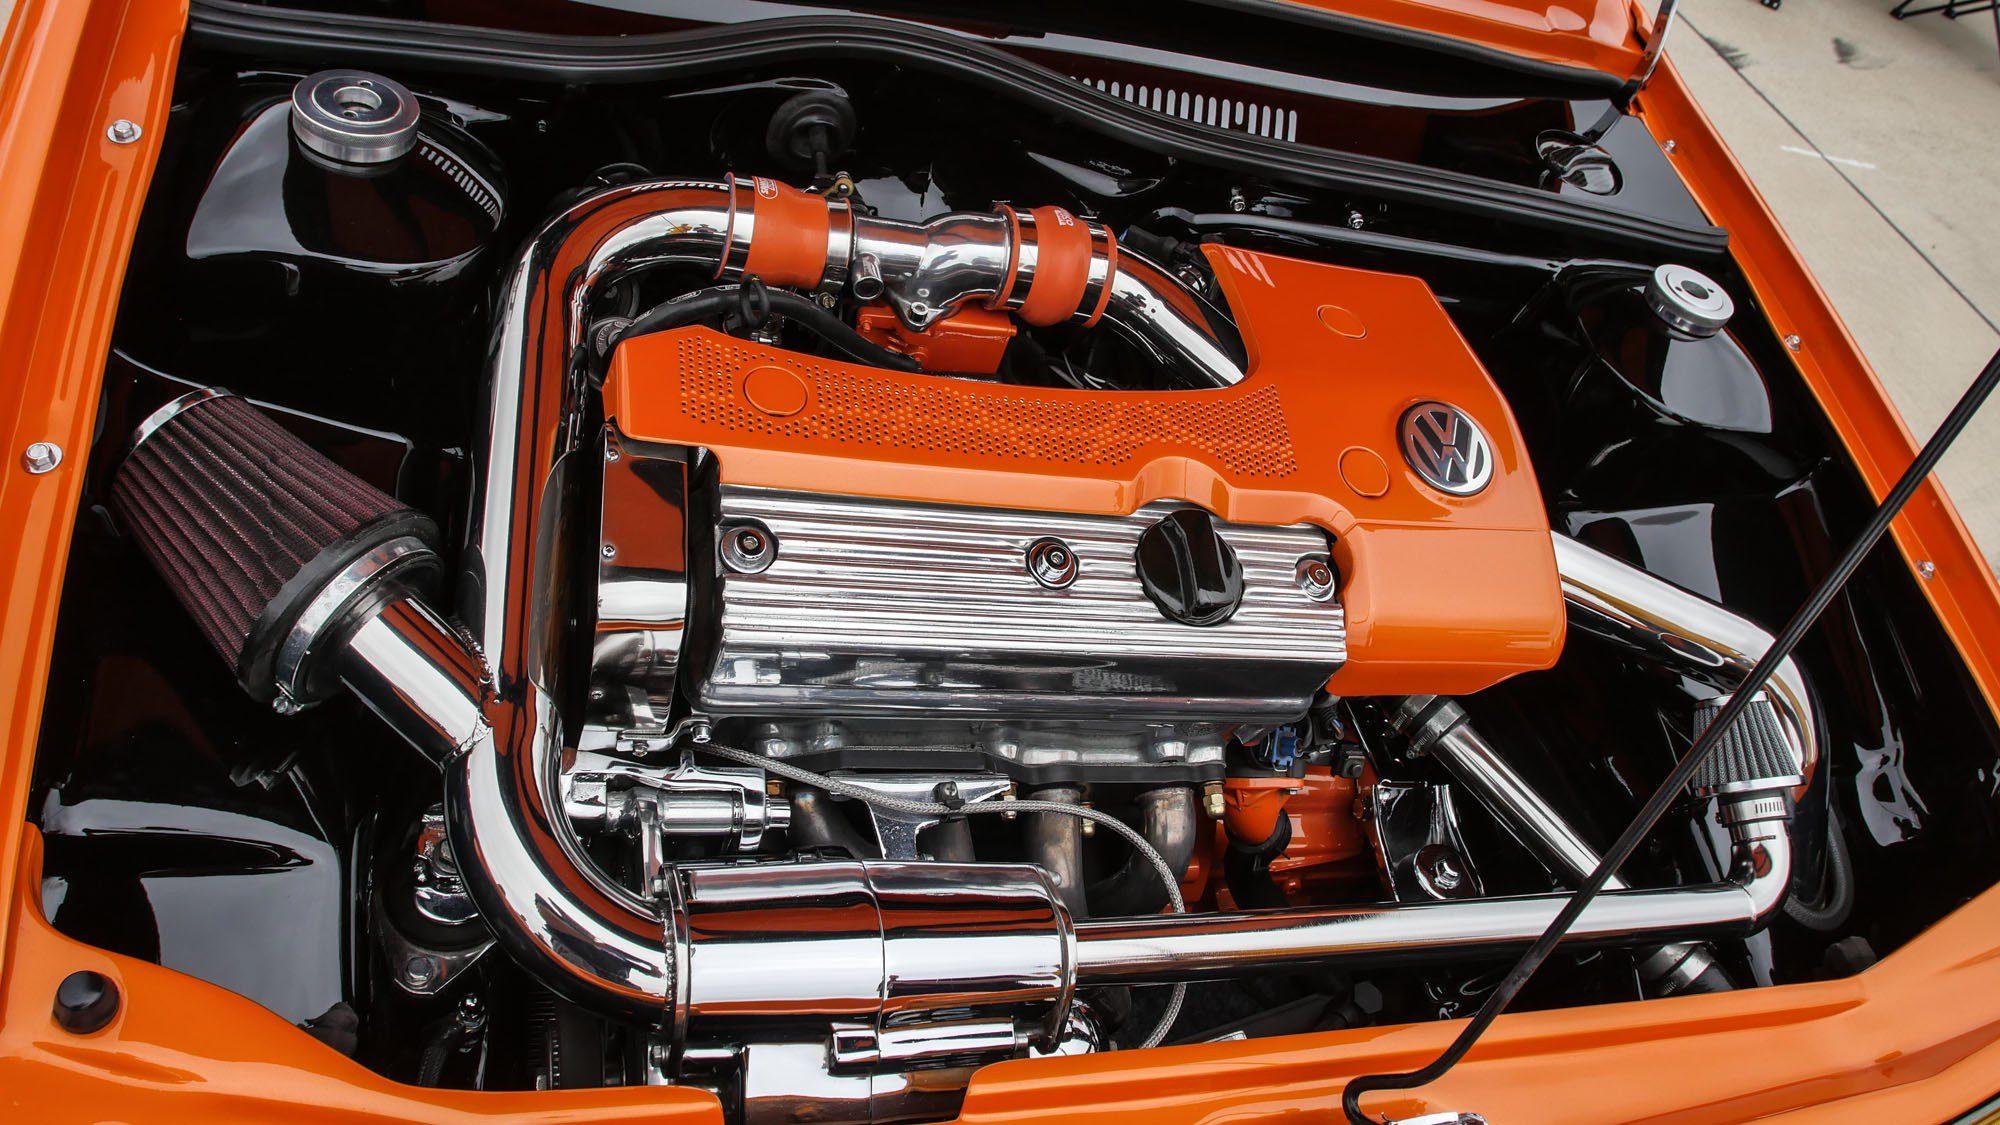 Motorraum des VW Polo 86C